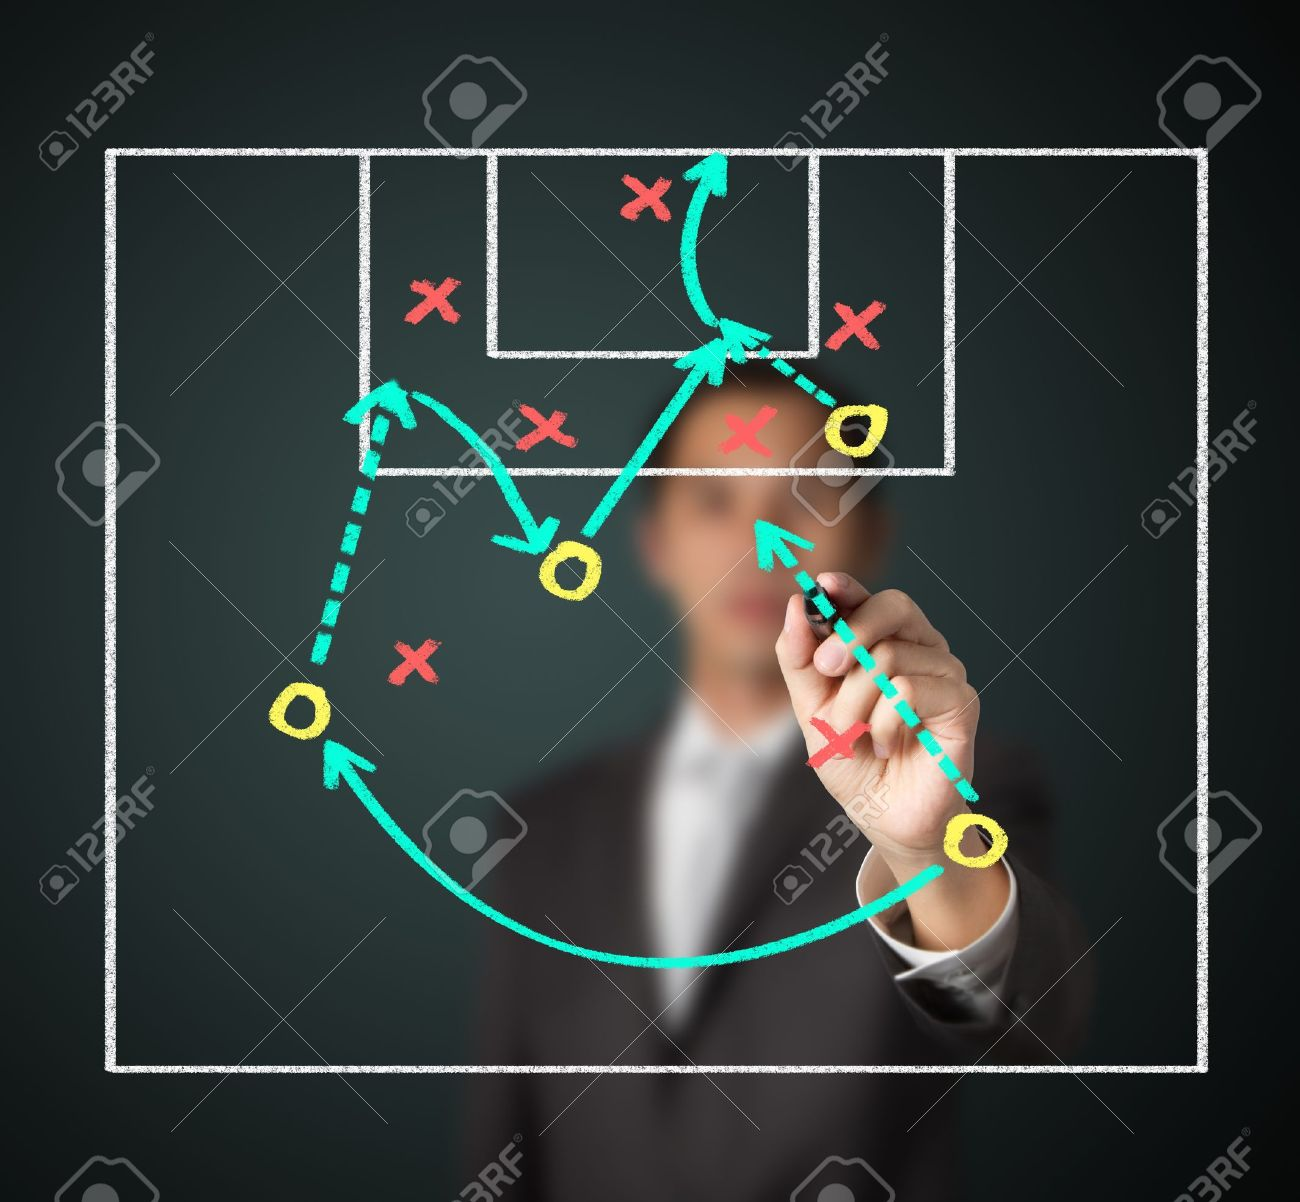 Sports coaching business plan